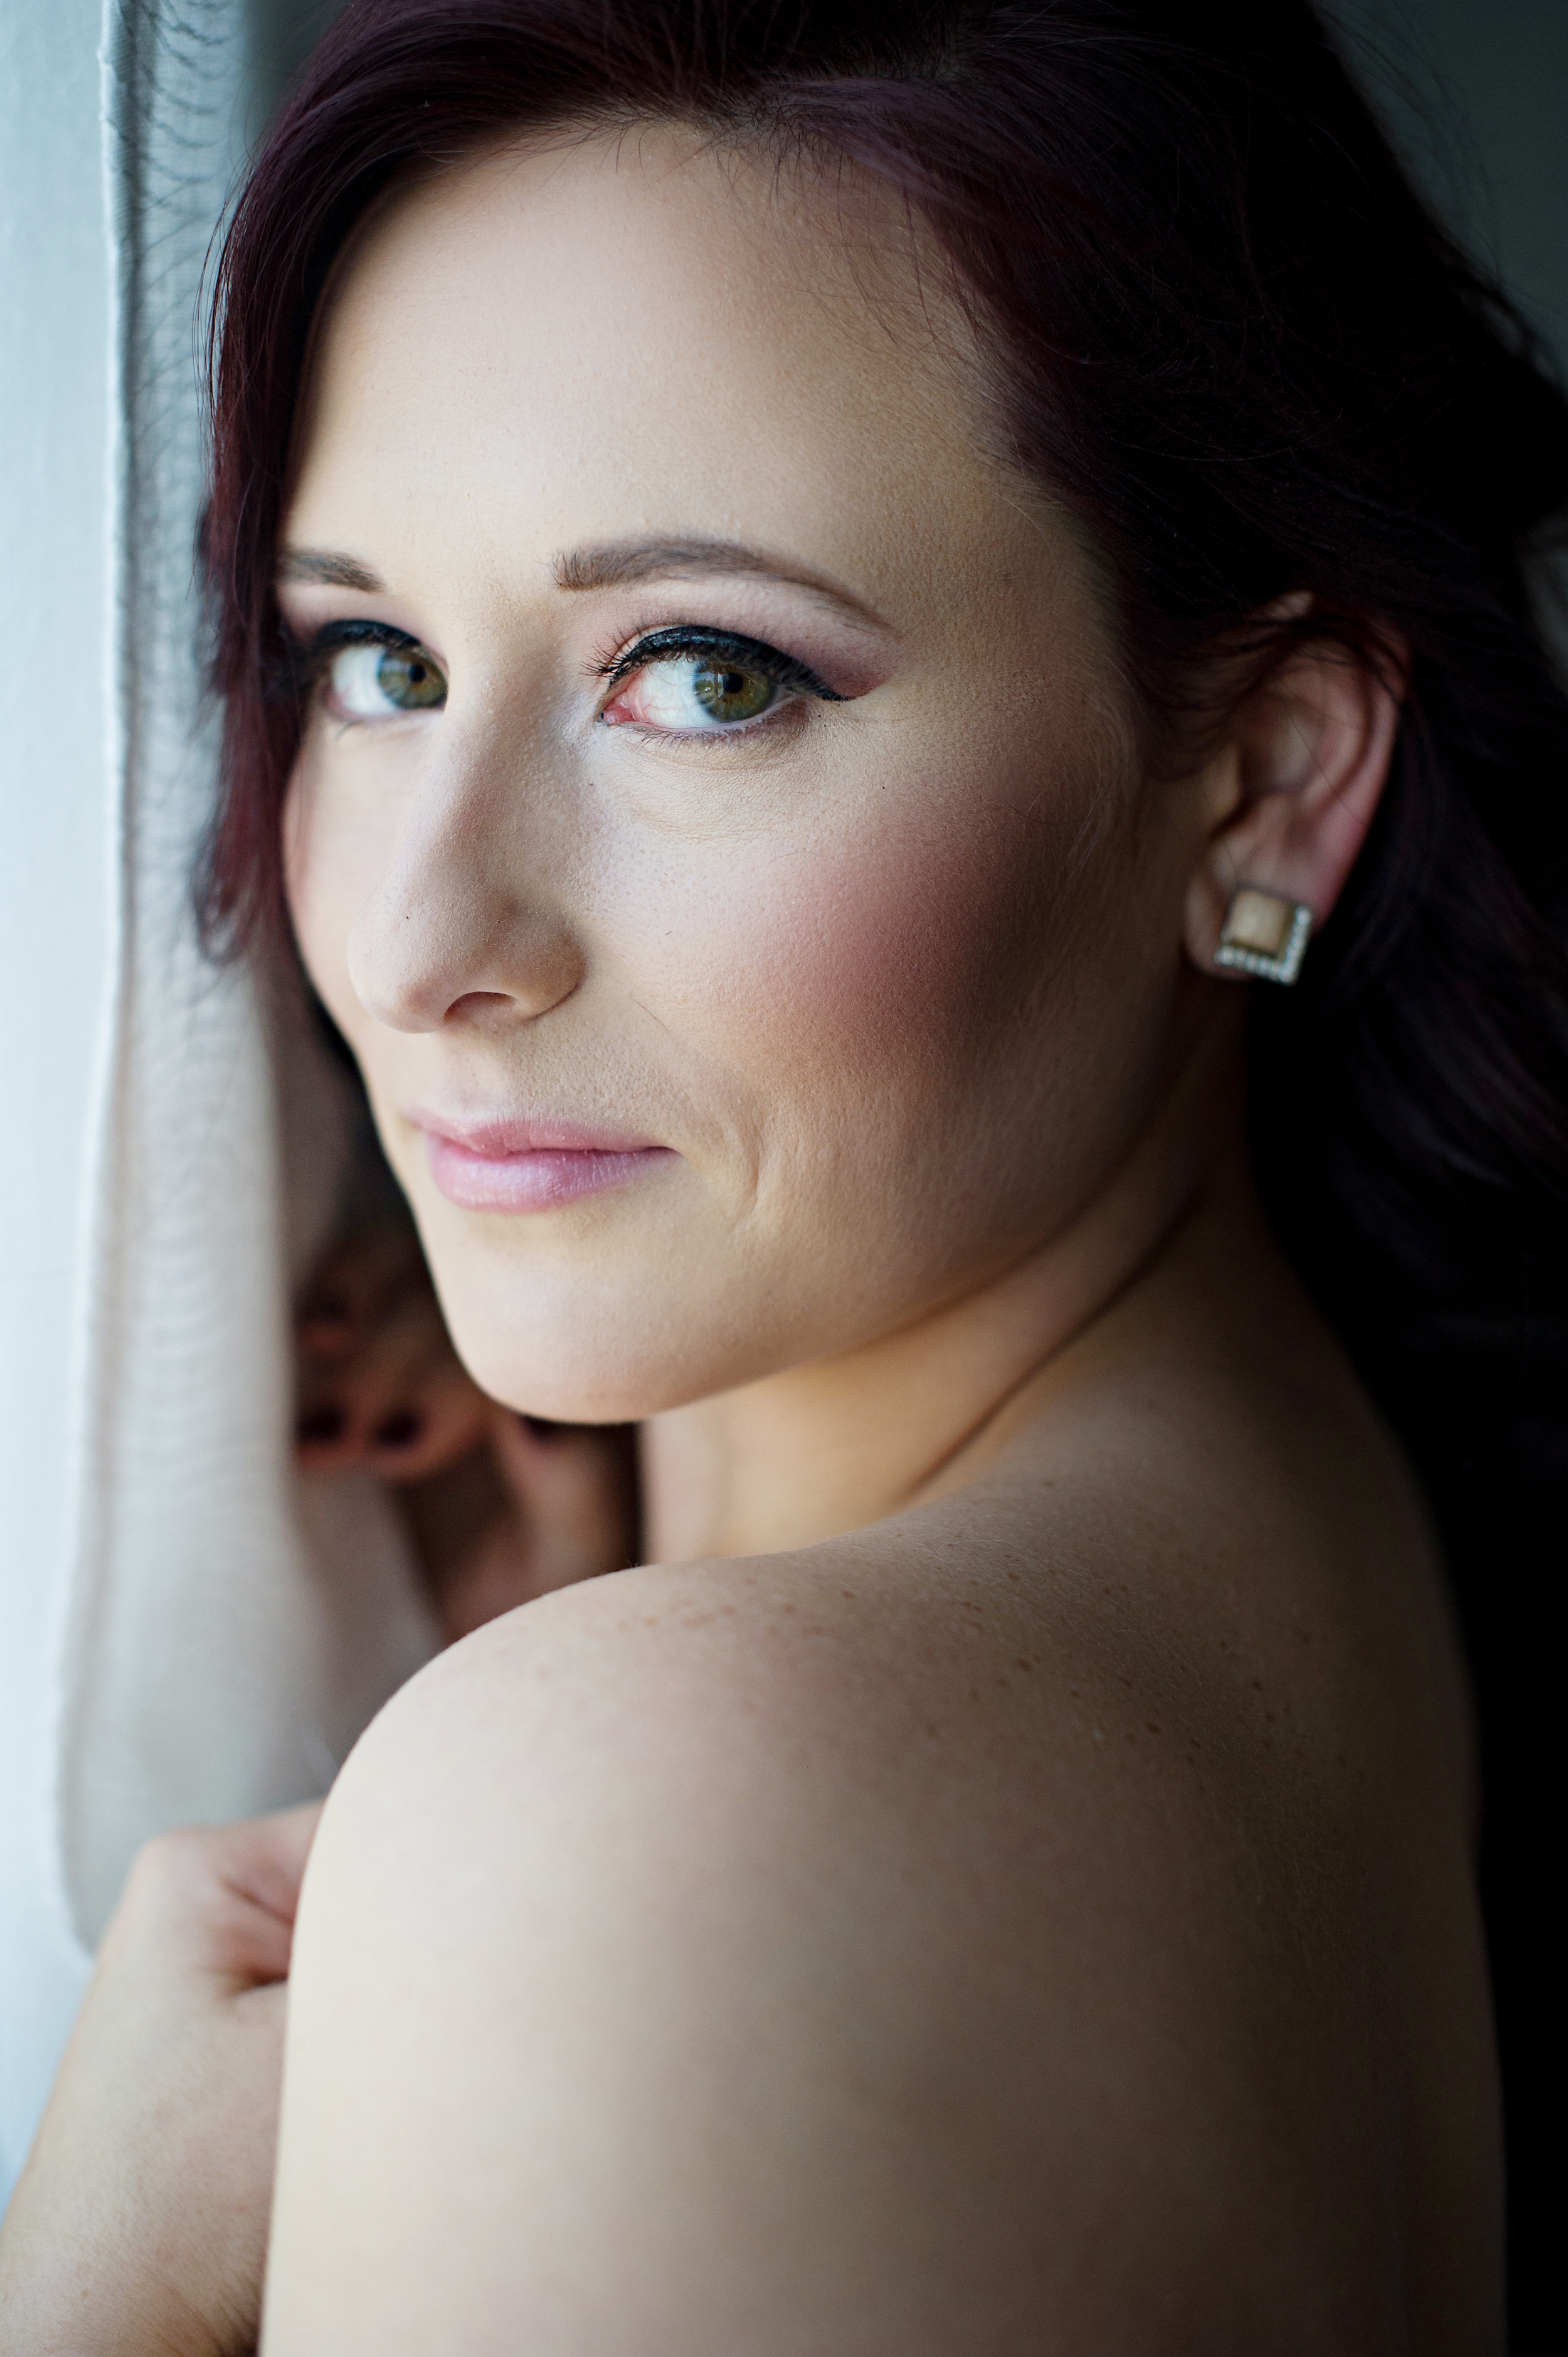 Louise (Gypsy Rose Lee): Sarah Elisabeth Abbott-Carter